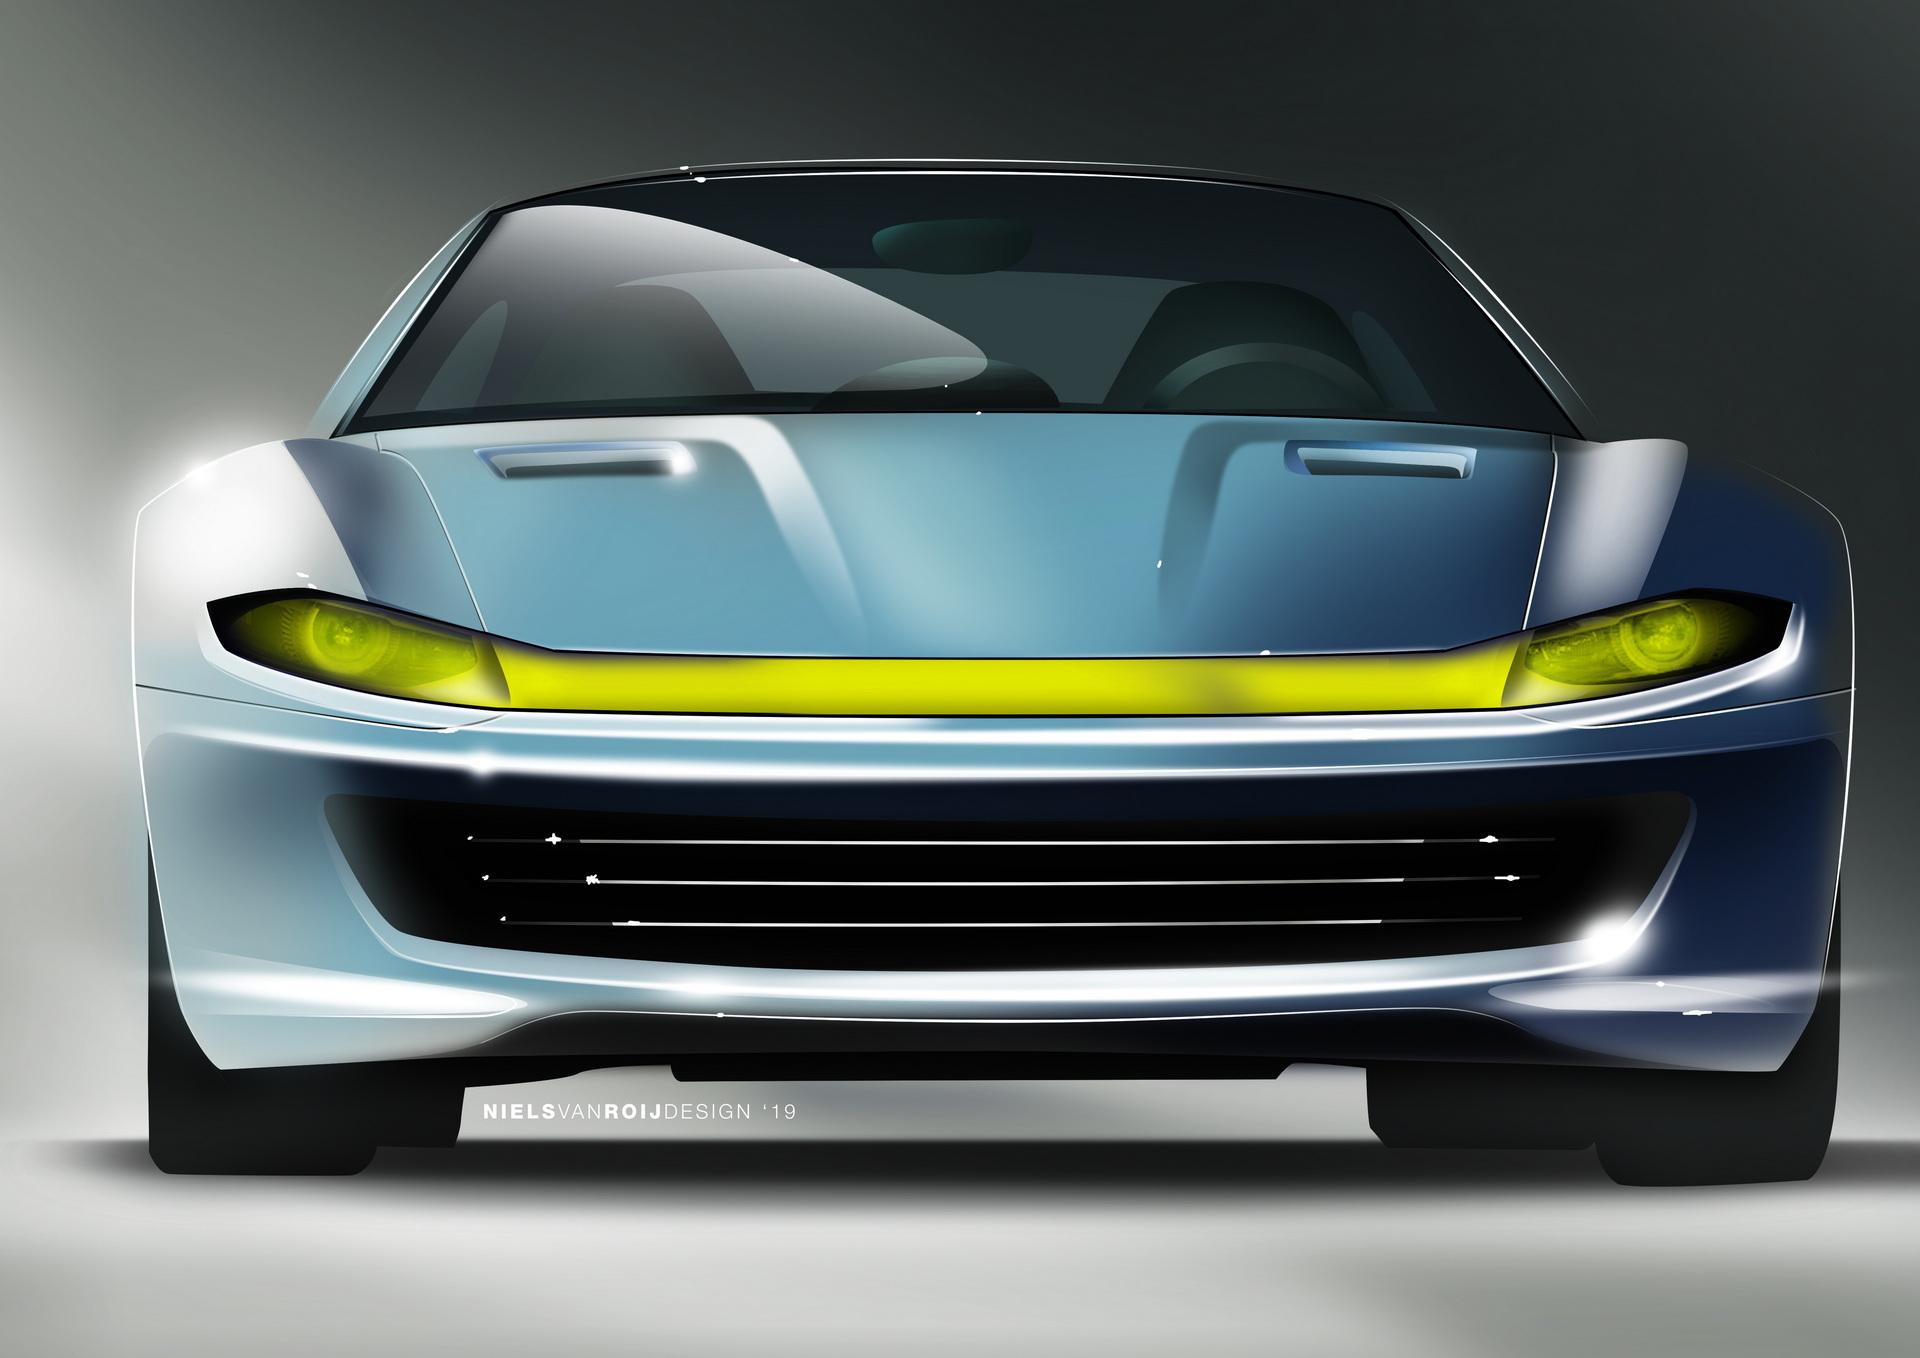 Ferrari-Daytona-Shooting-Brake-Hommage-by-Niels-van-Roij-Design-31